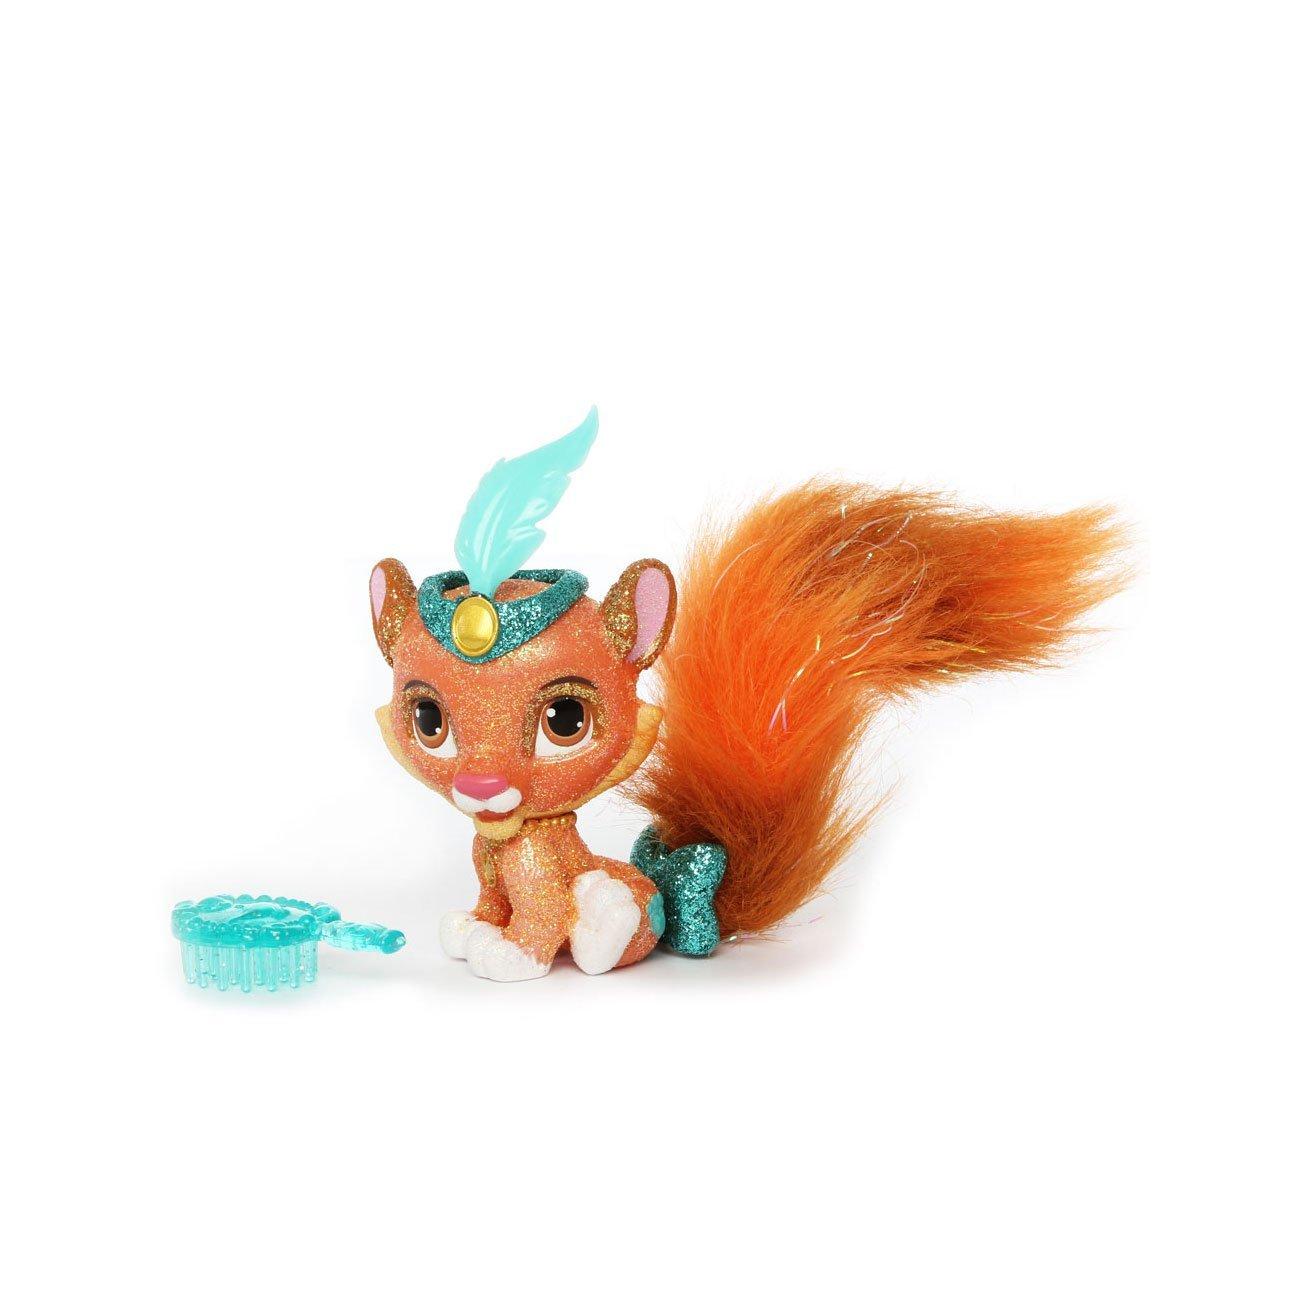 Disney Princess Palace Pets - Glitzy Glitter Friends - Jasmine's Tiger, Sultan